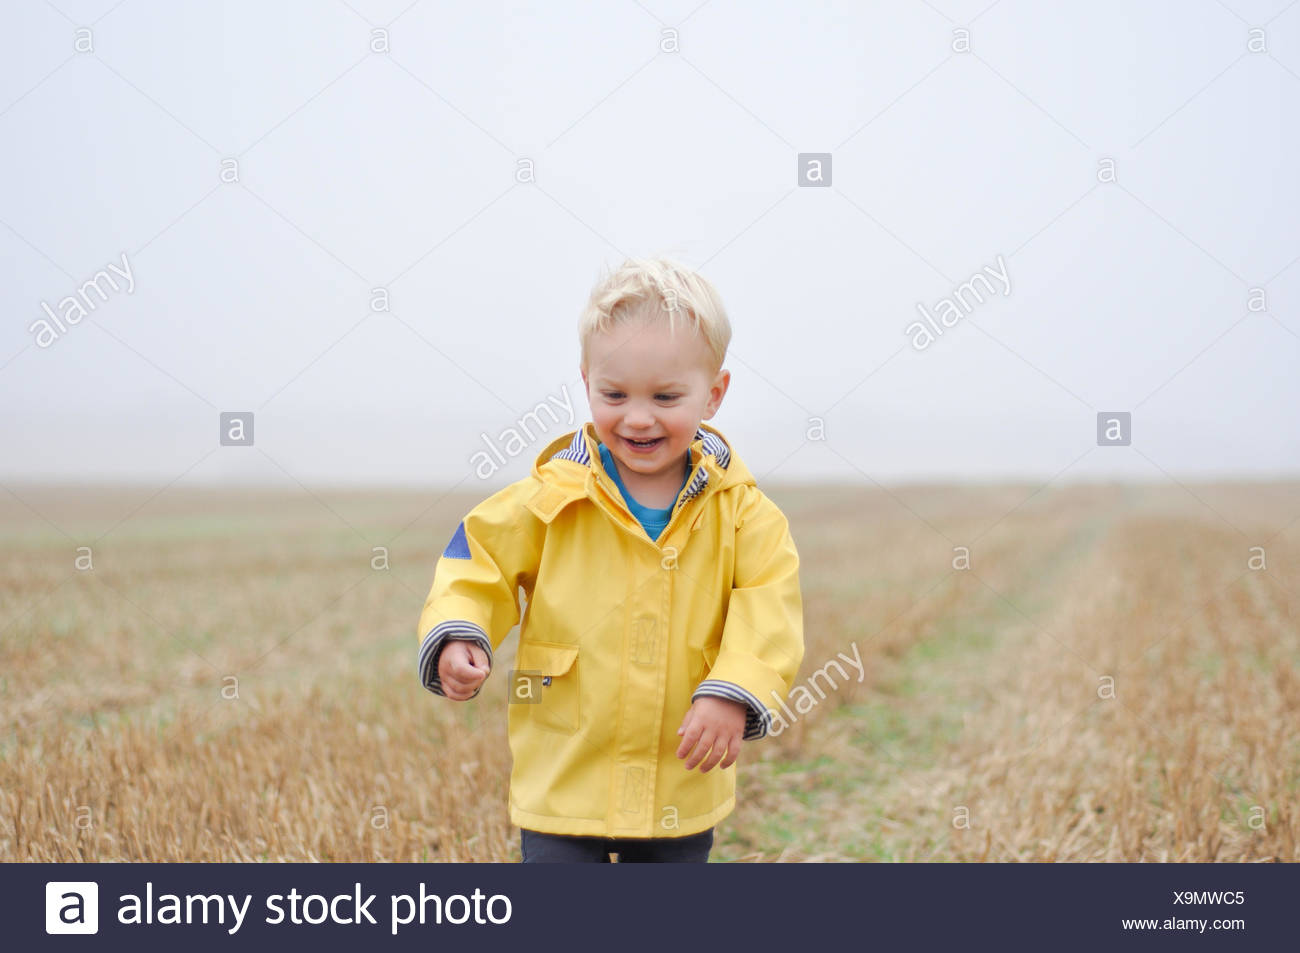 Boy in a rain coat standing in a wheat field, England, UK - Stock Image